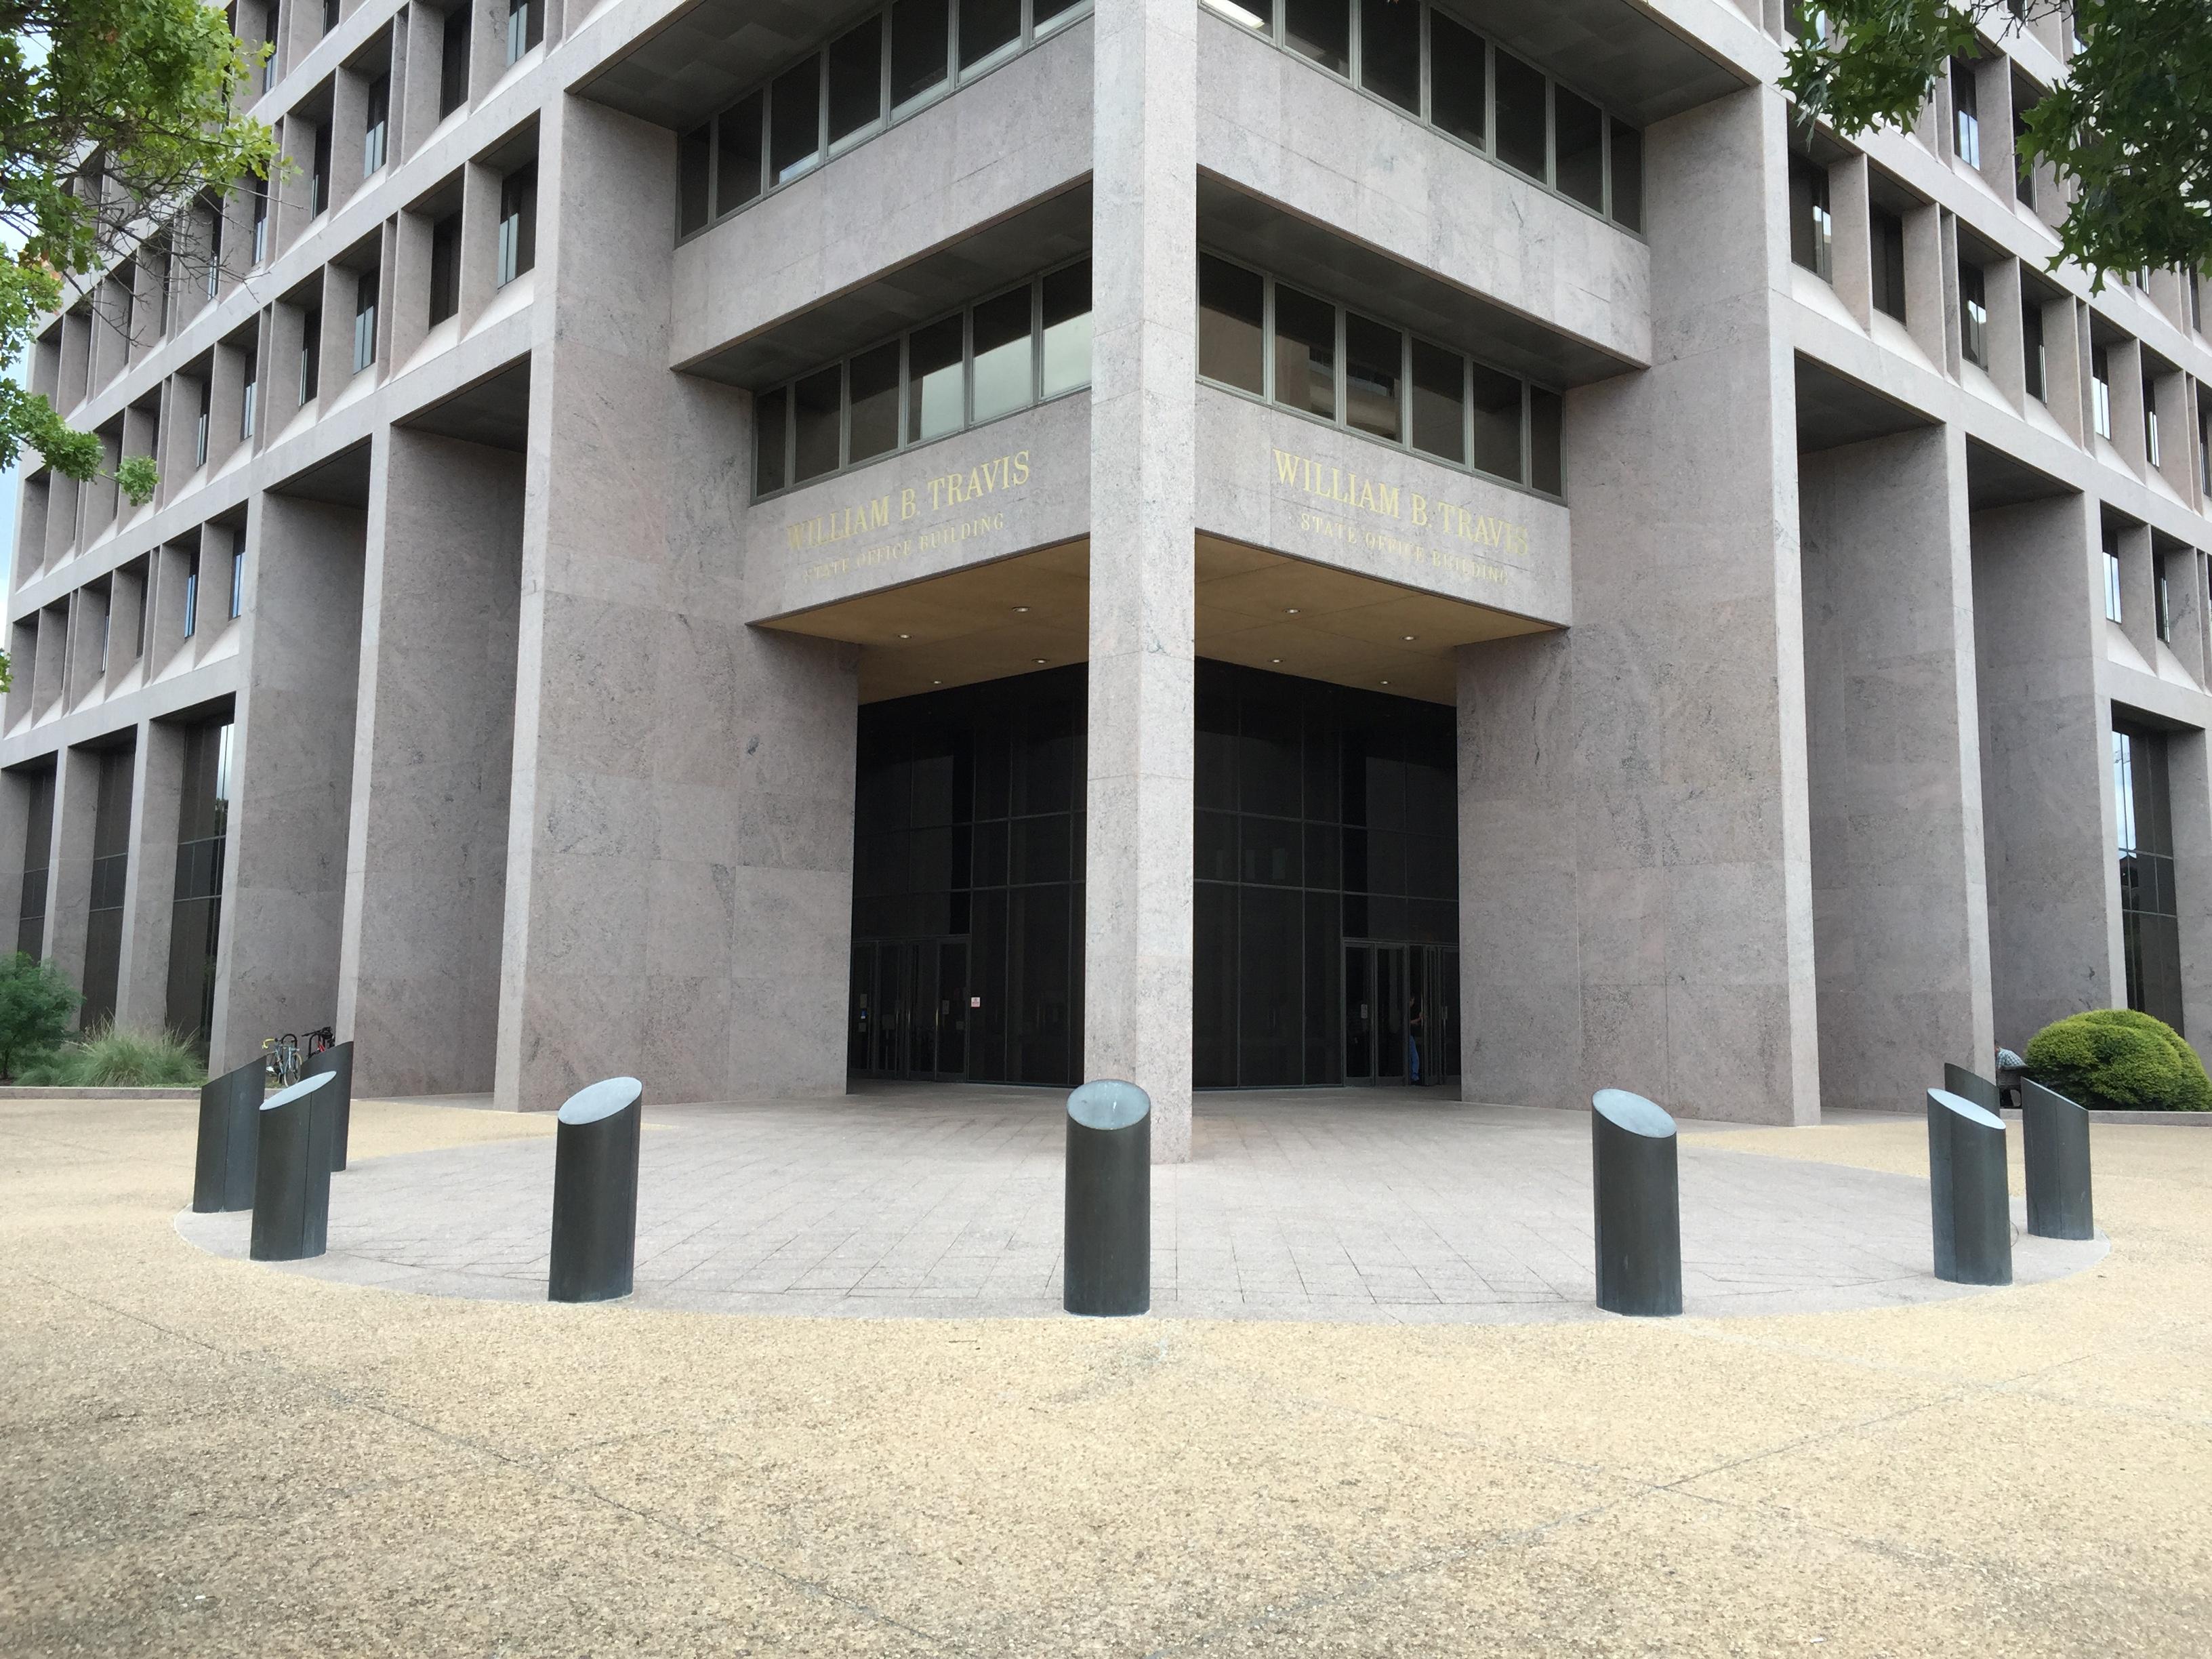 Caption: Bollards outside the William B. Travis Building, Credit: Matt Croydon